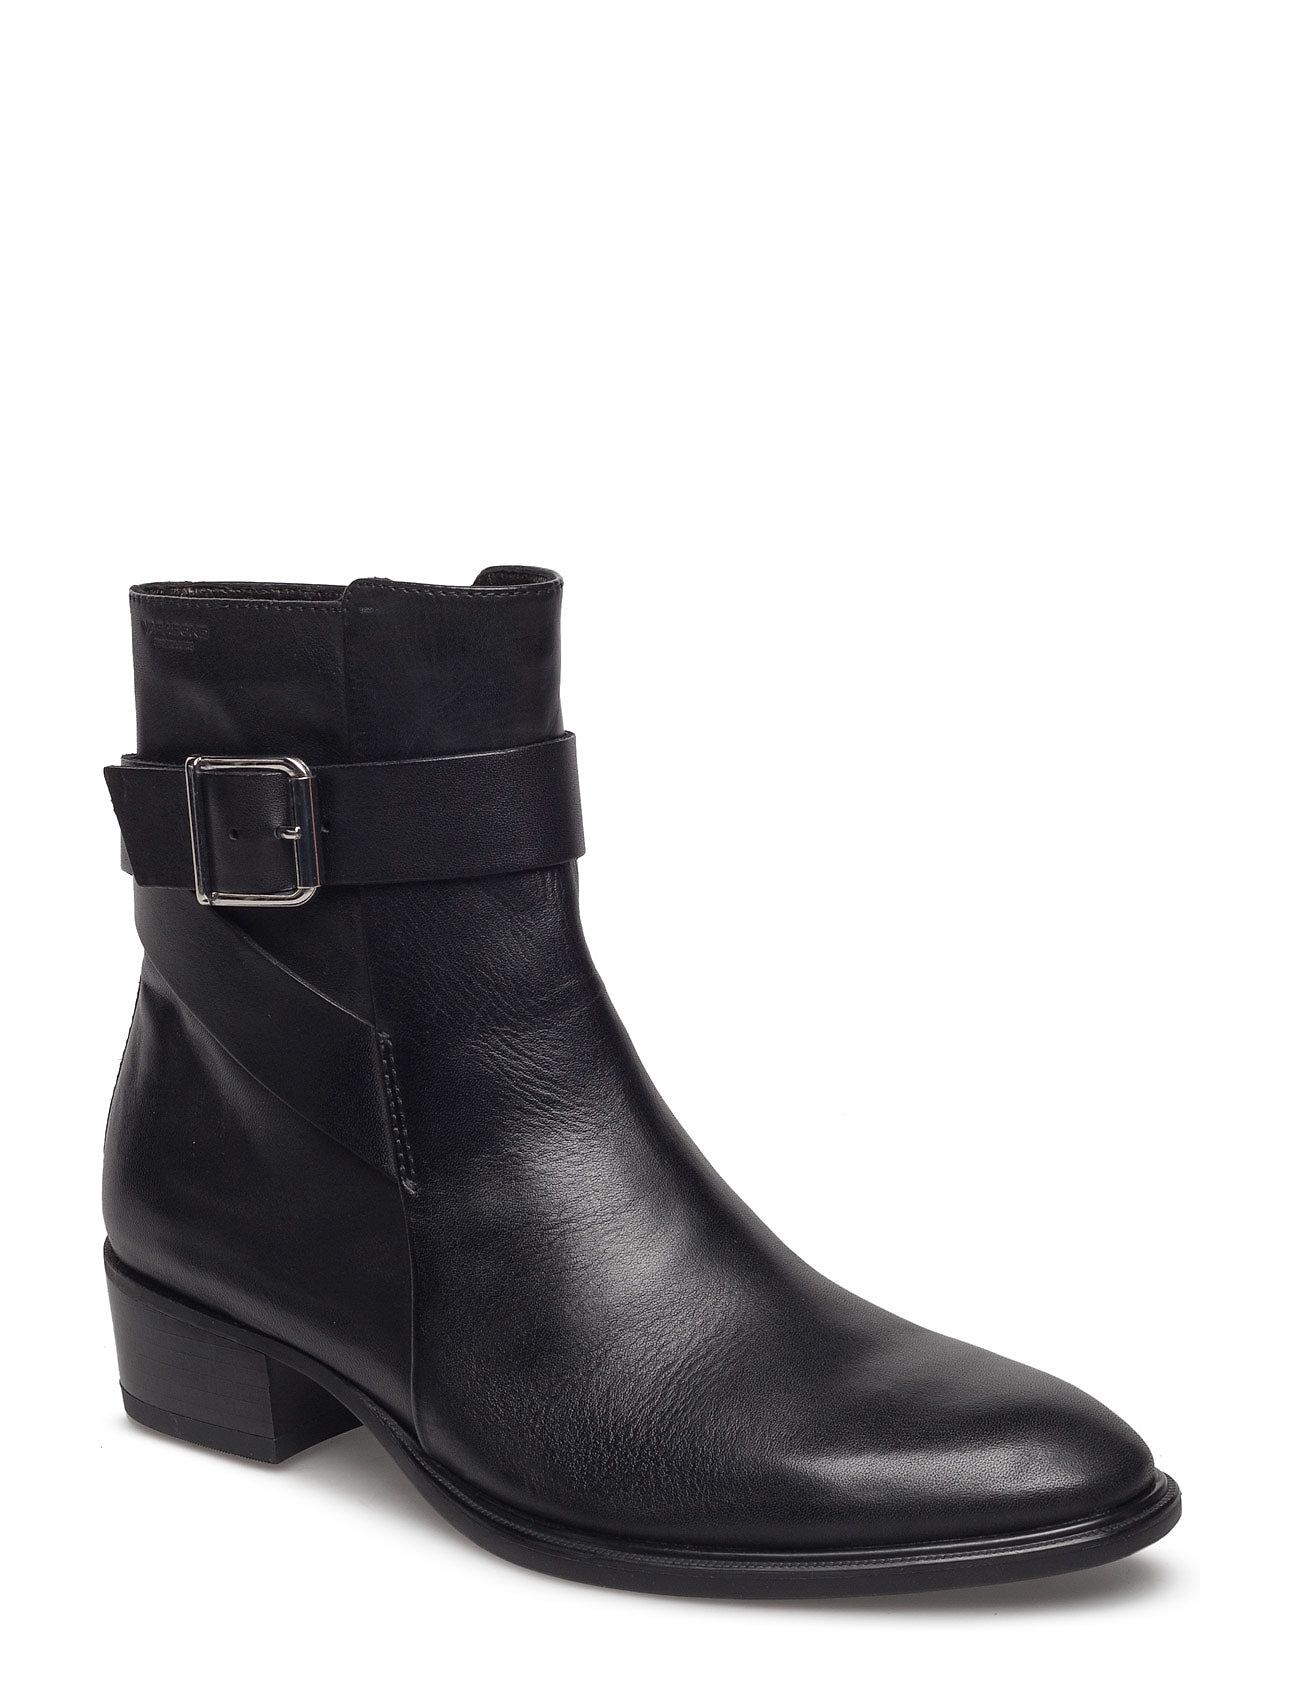 Meja VAGABOND Støvler til Damer i Sort